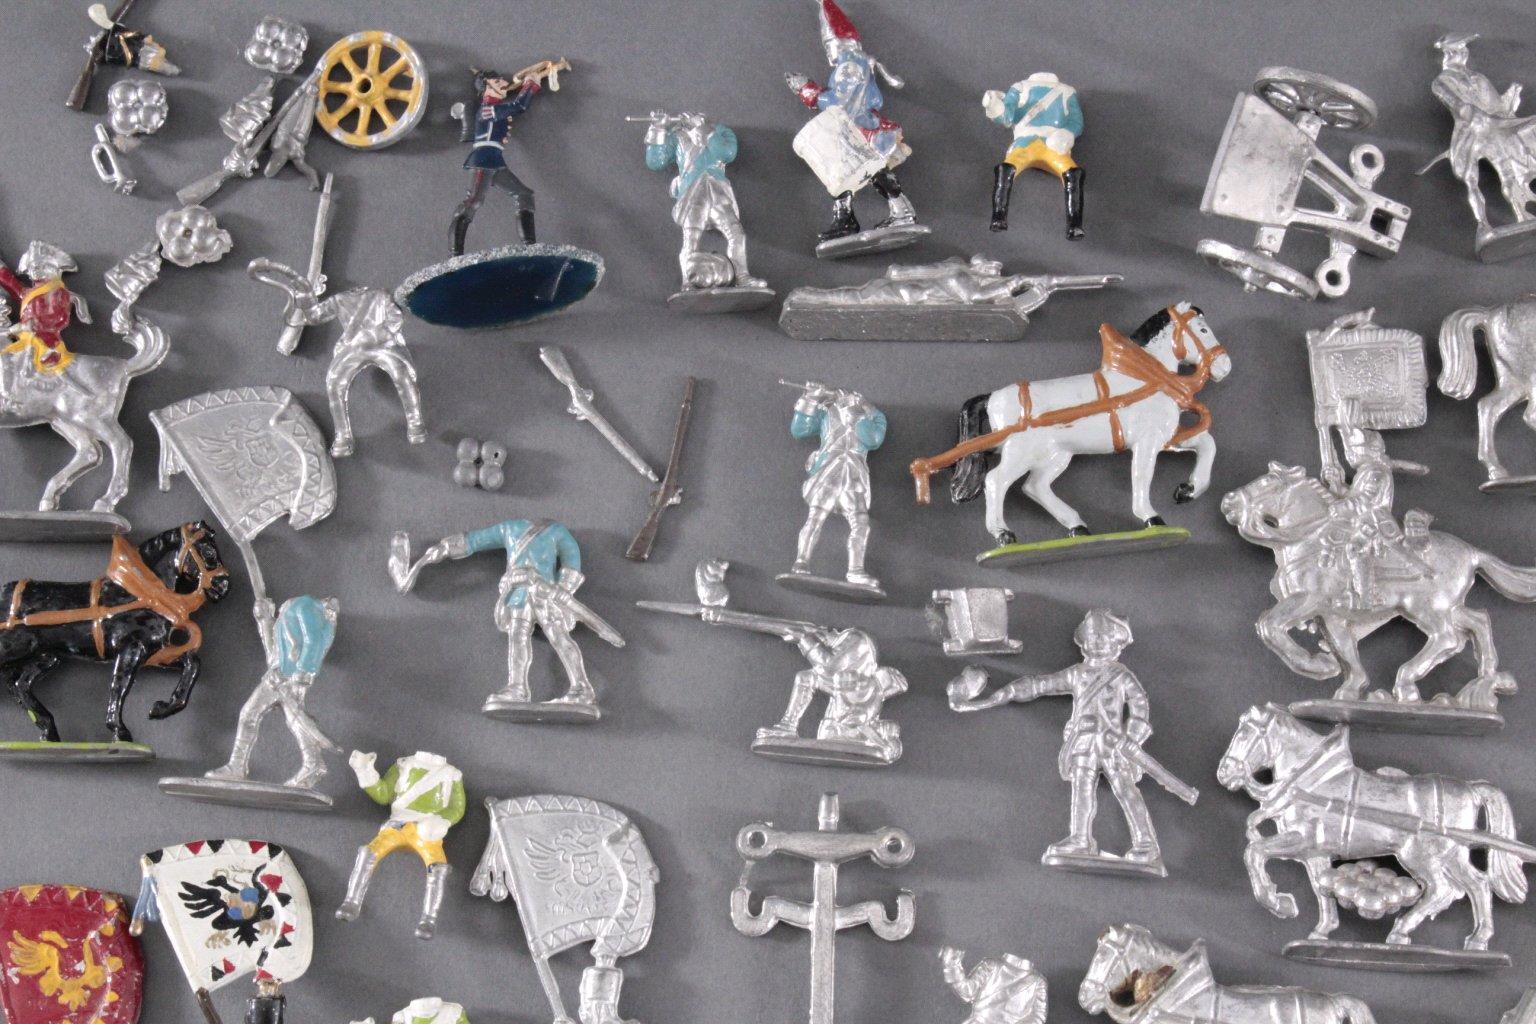 Sammlung Zinnfiguren, weit über 60 Stück-2